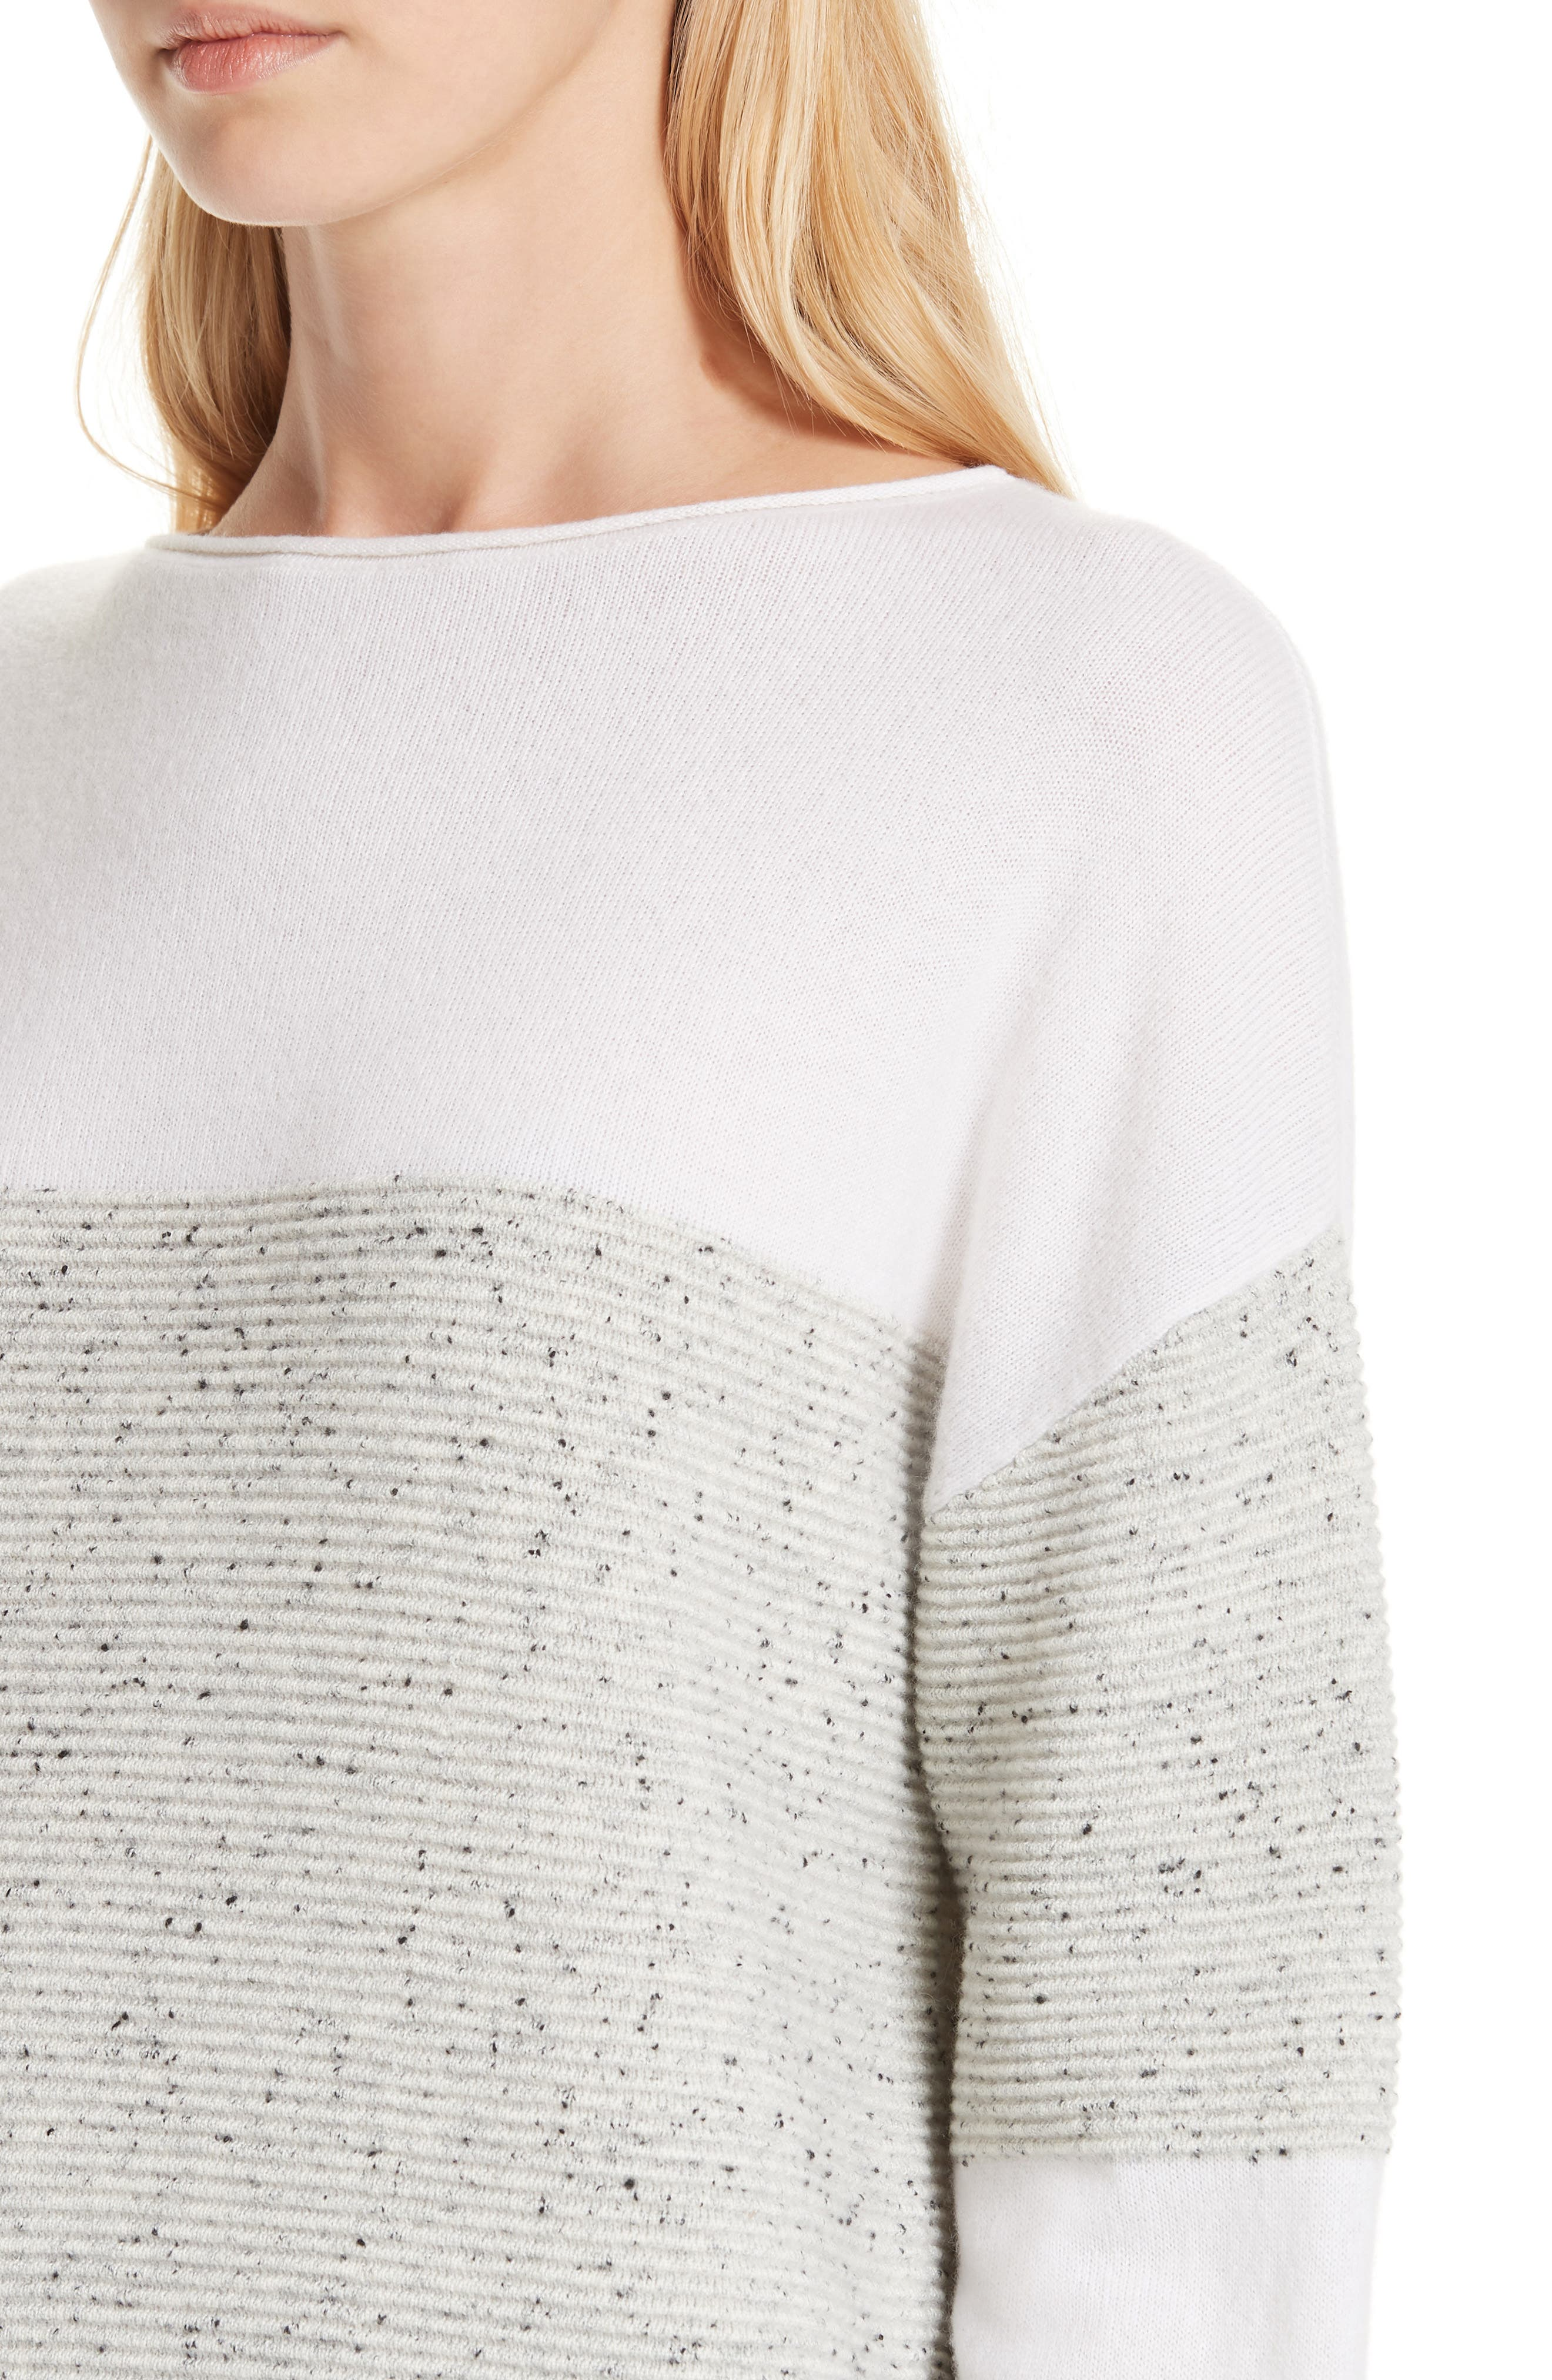 Colorblock Cashmere Sweater,                             Alternate thumbnail 4, color,                             IVORY SOFT MULTI COLOR BLOCK